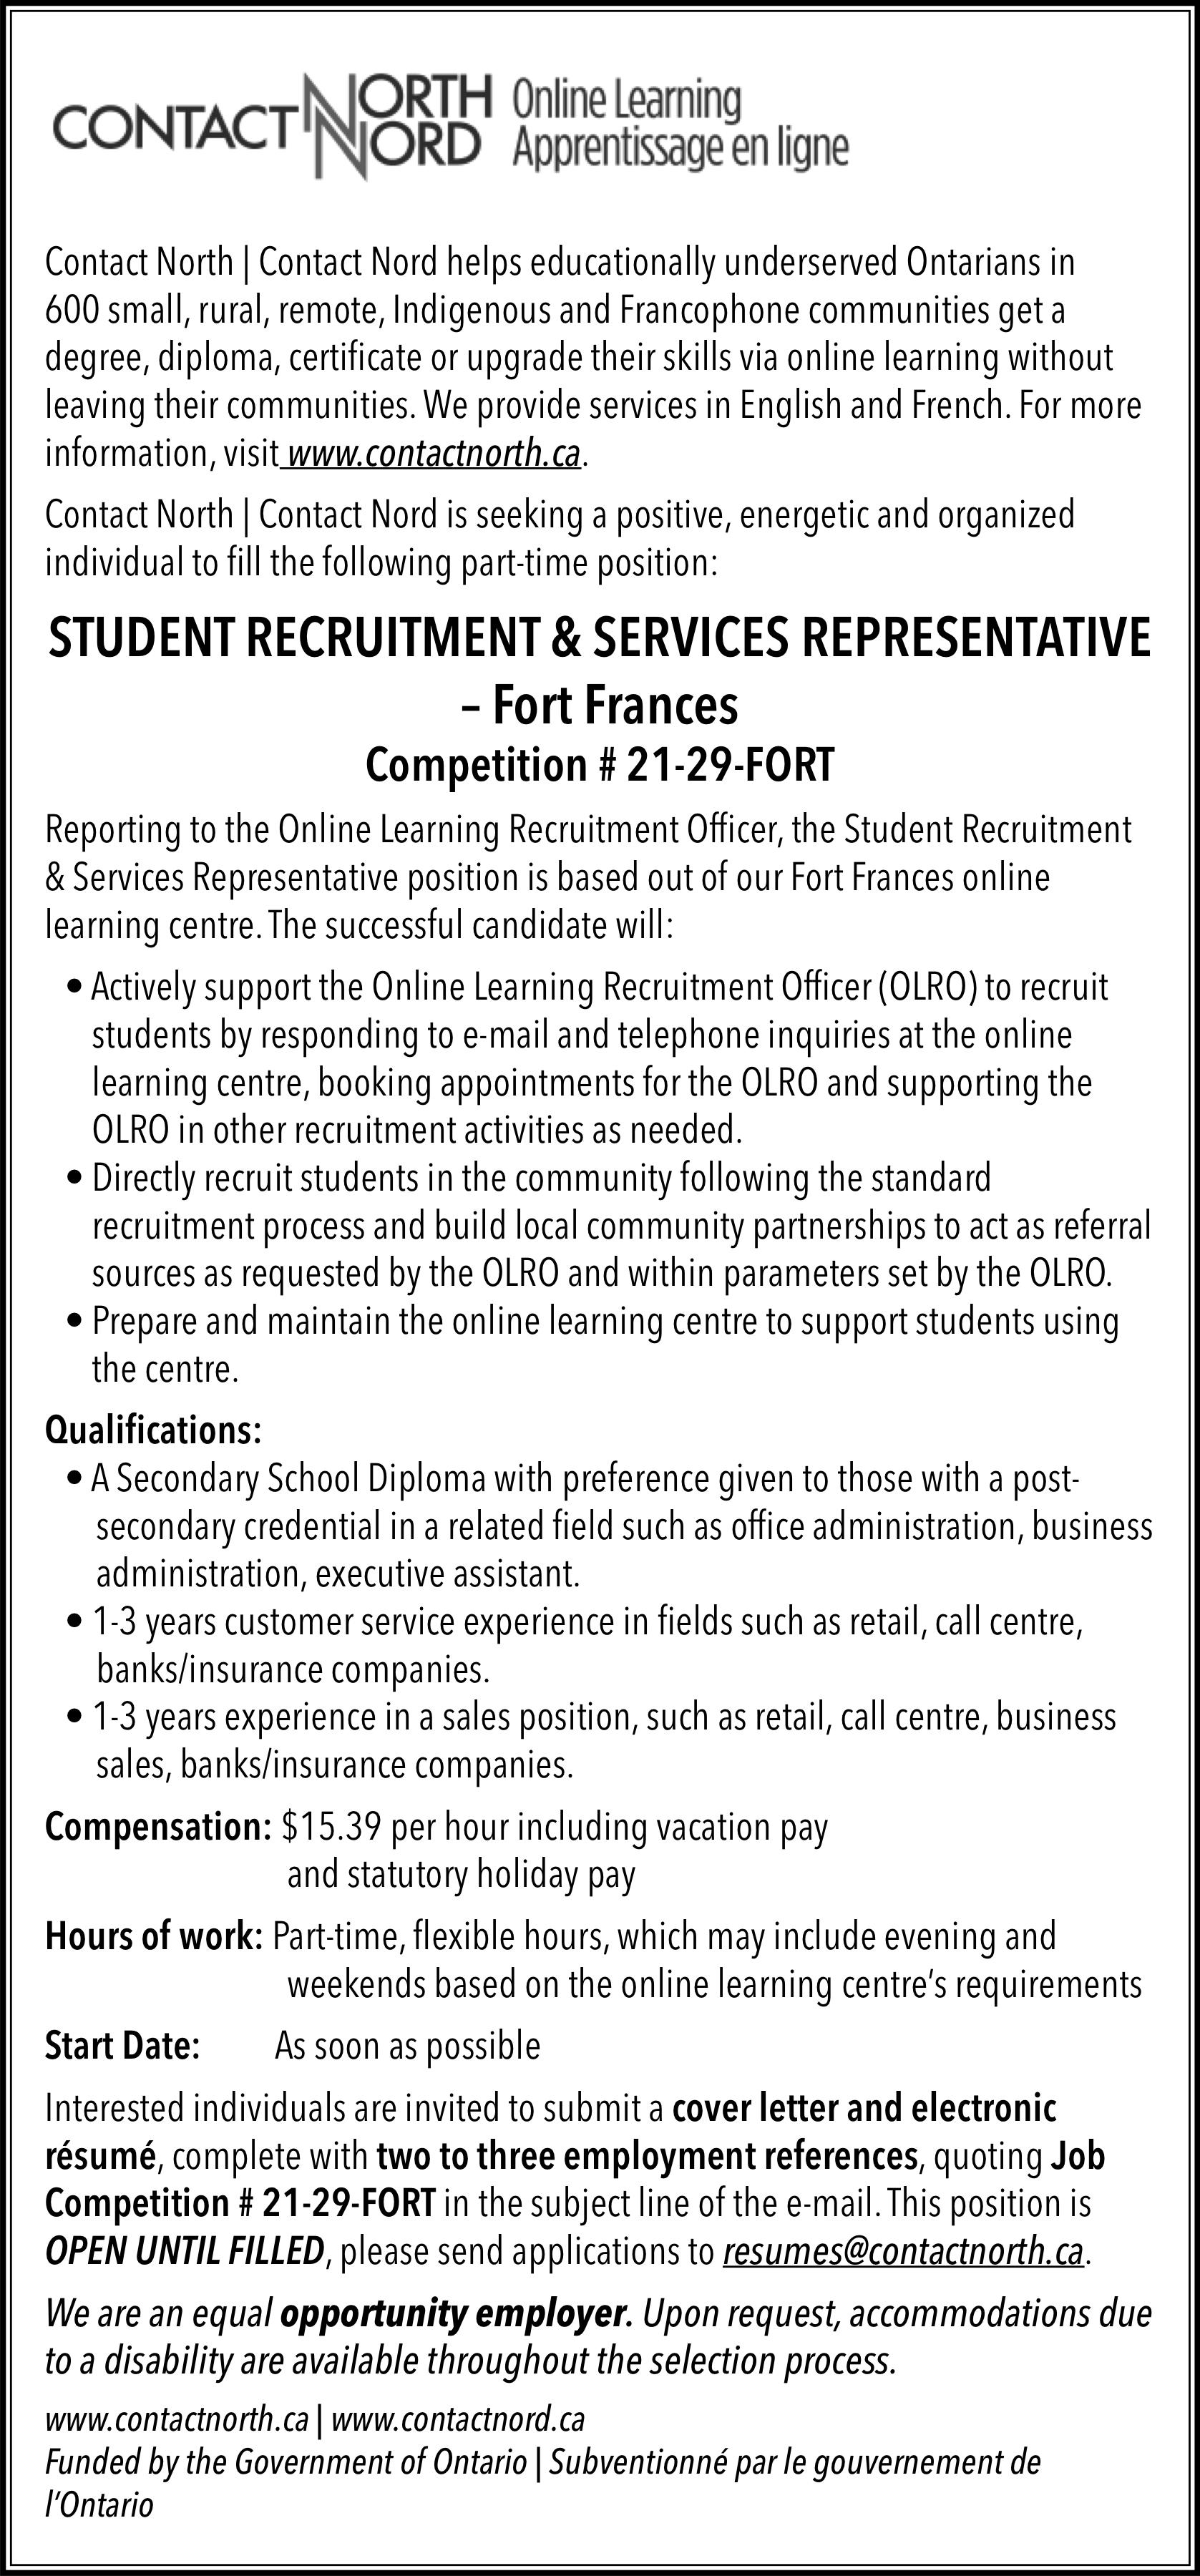 Student Recruitment & Services Representative